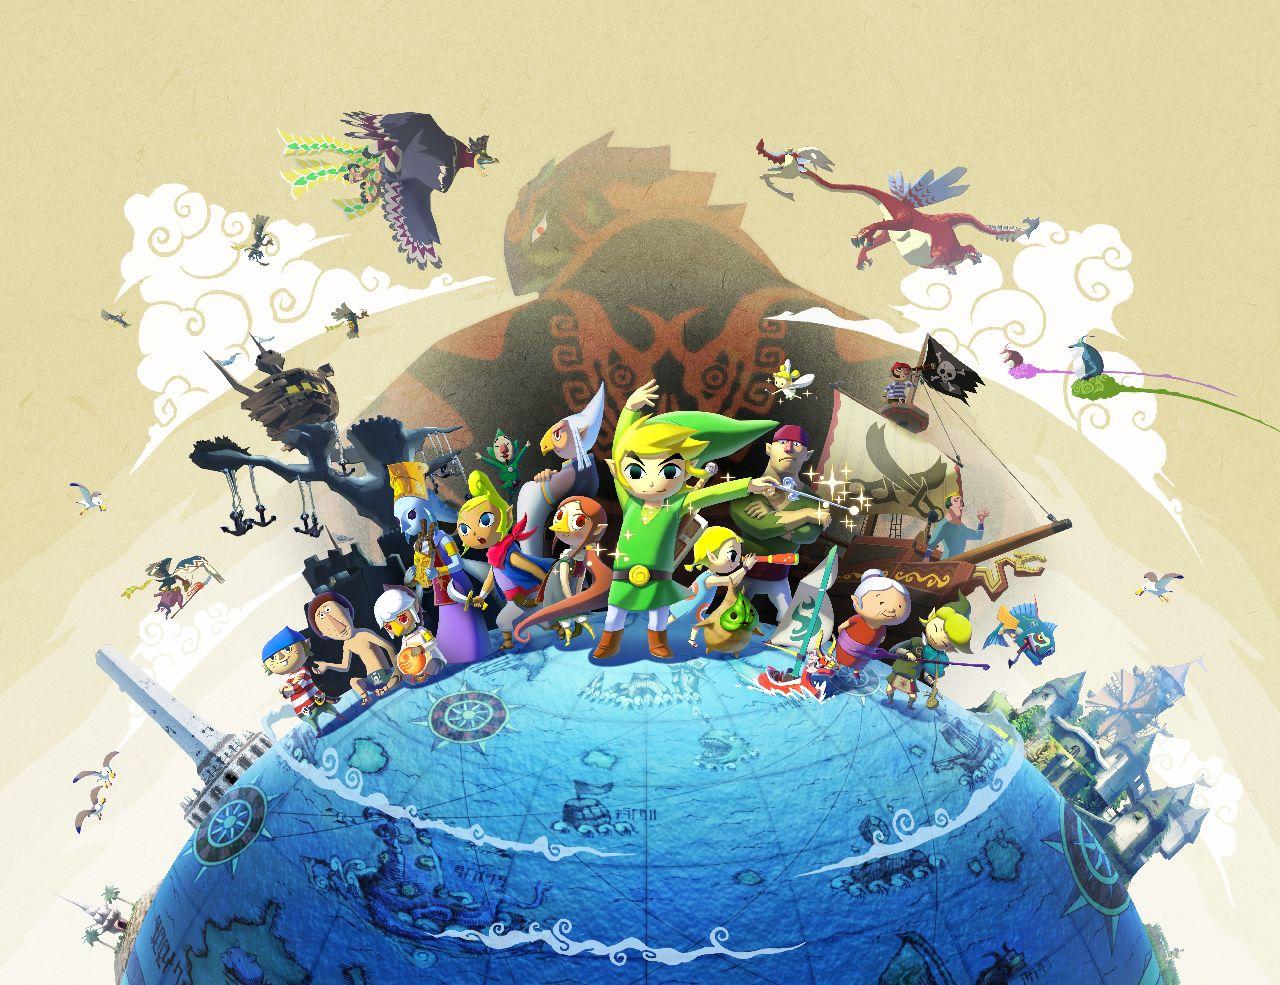 Wii U Sales up 685% in UK